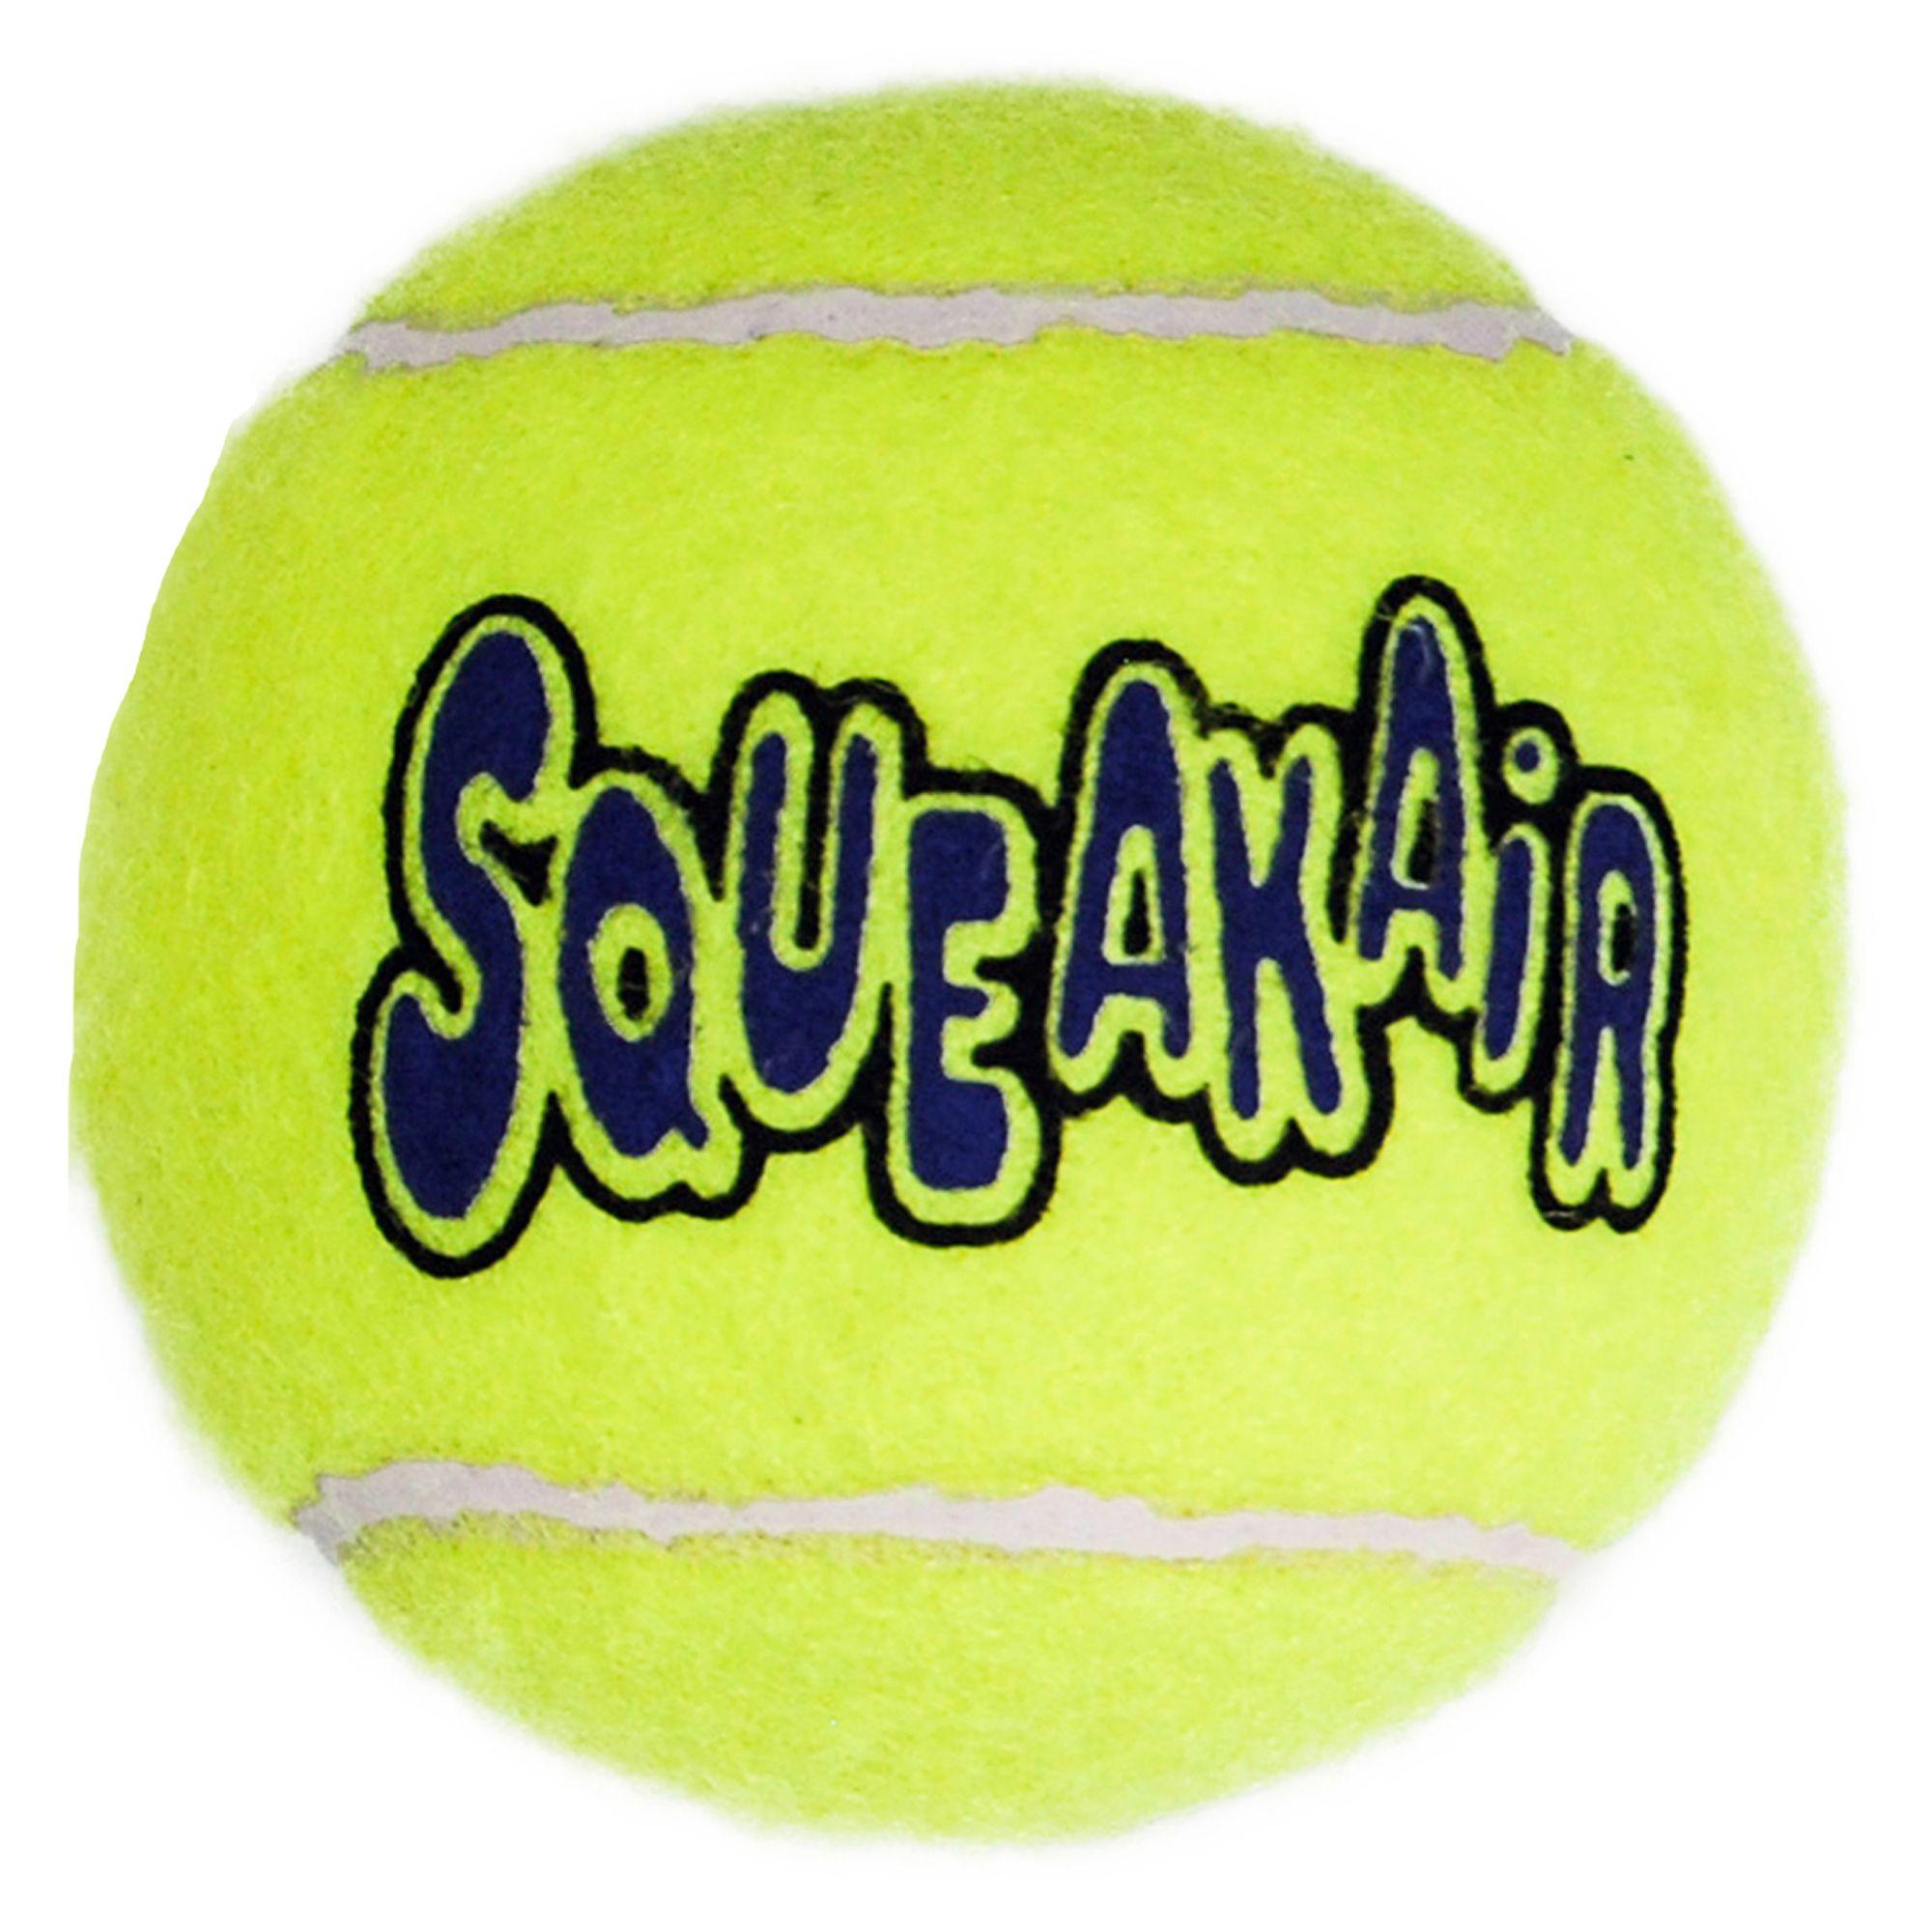 Kong Airdog Tennis Ball Squeaker Dog Toy Dog Balls Petsmart